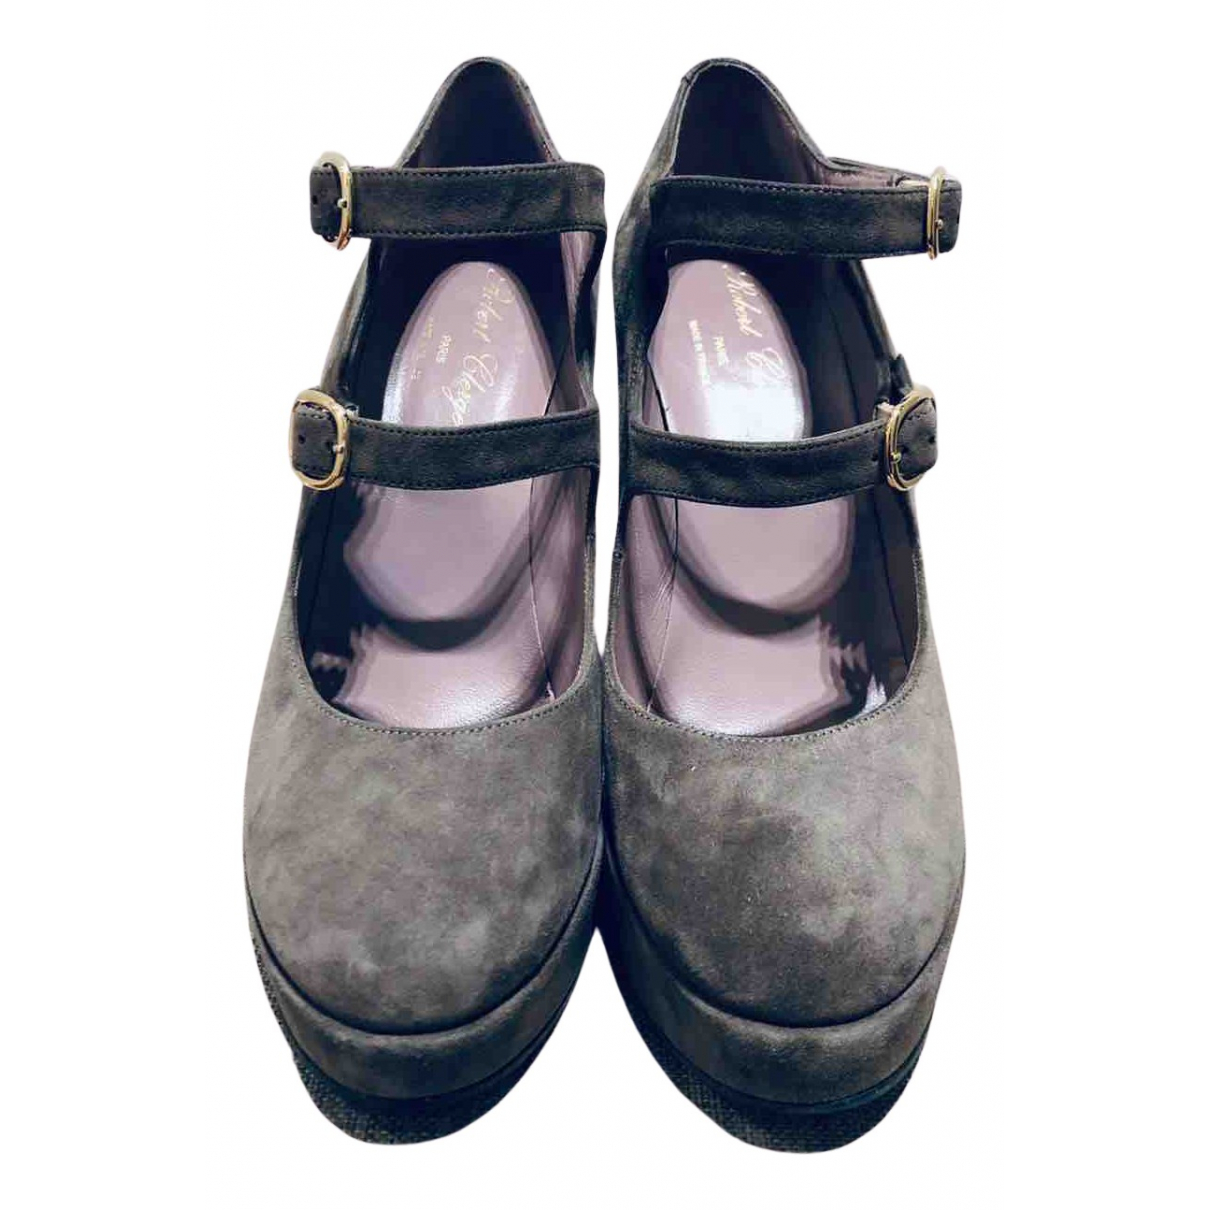 Robert Clergerie N Grey Suede Sandals for Women 38 EU